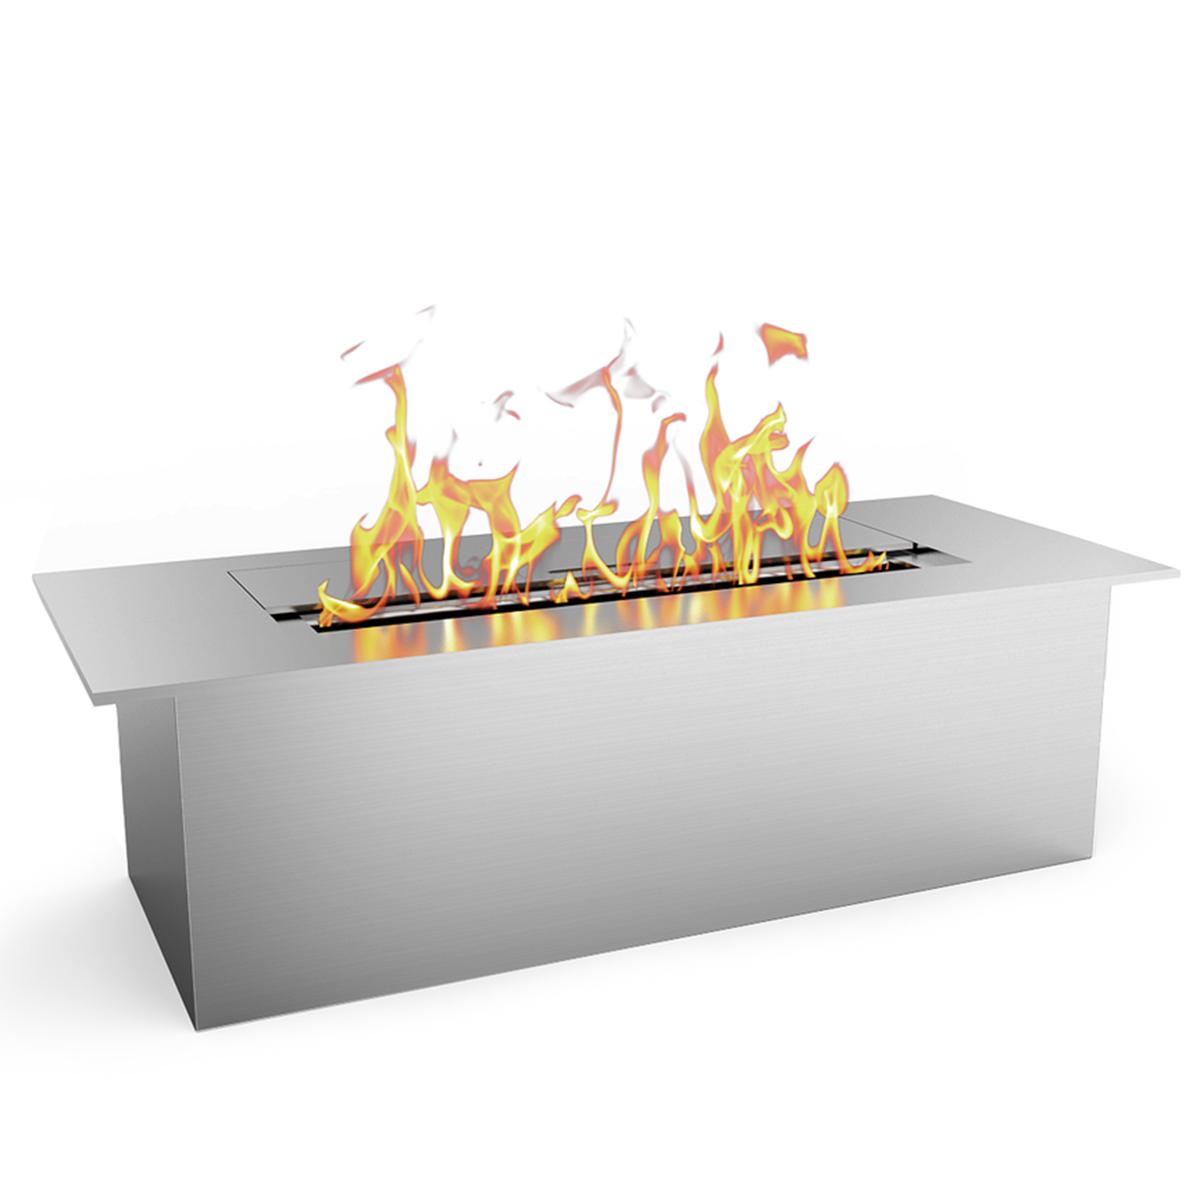 Regal Flame Slim 8 Inch Bio Ethanol Fireplace Burner Insert .5 Liter. All Types of Indoor, Gas Inserts, Ventless & Vent Free, El